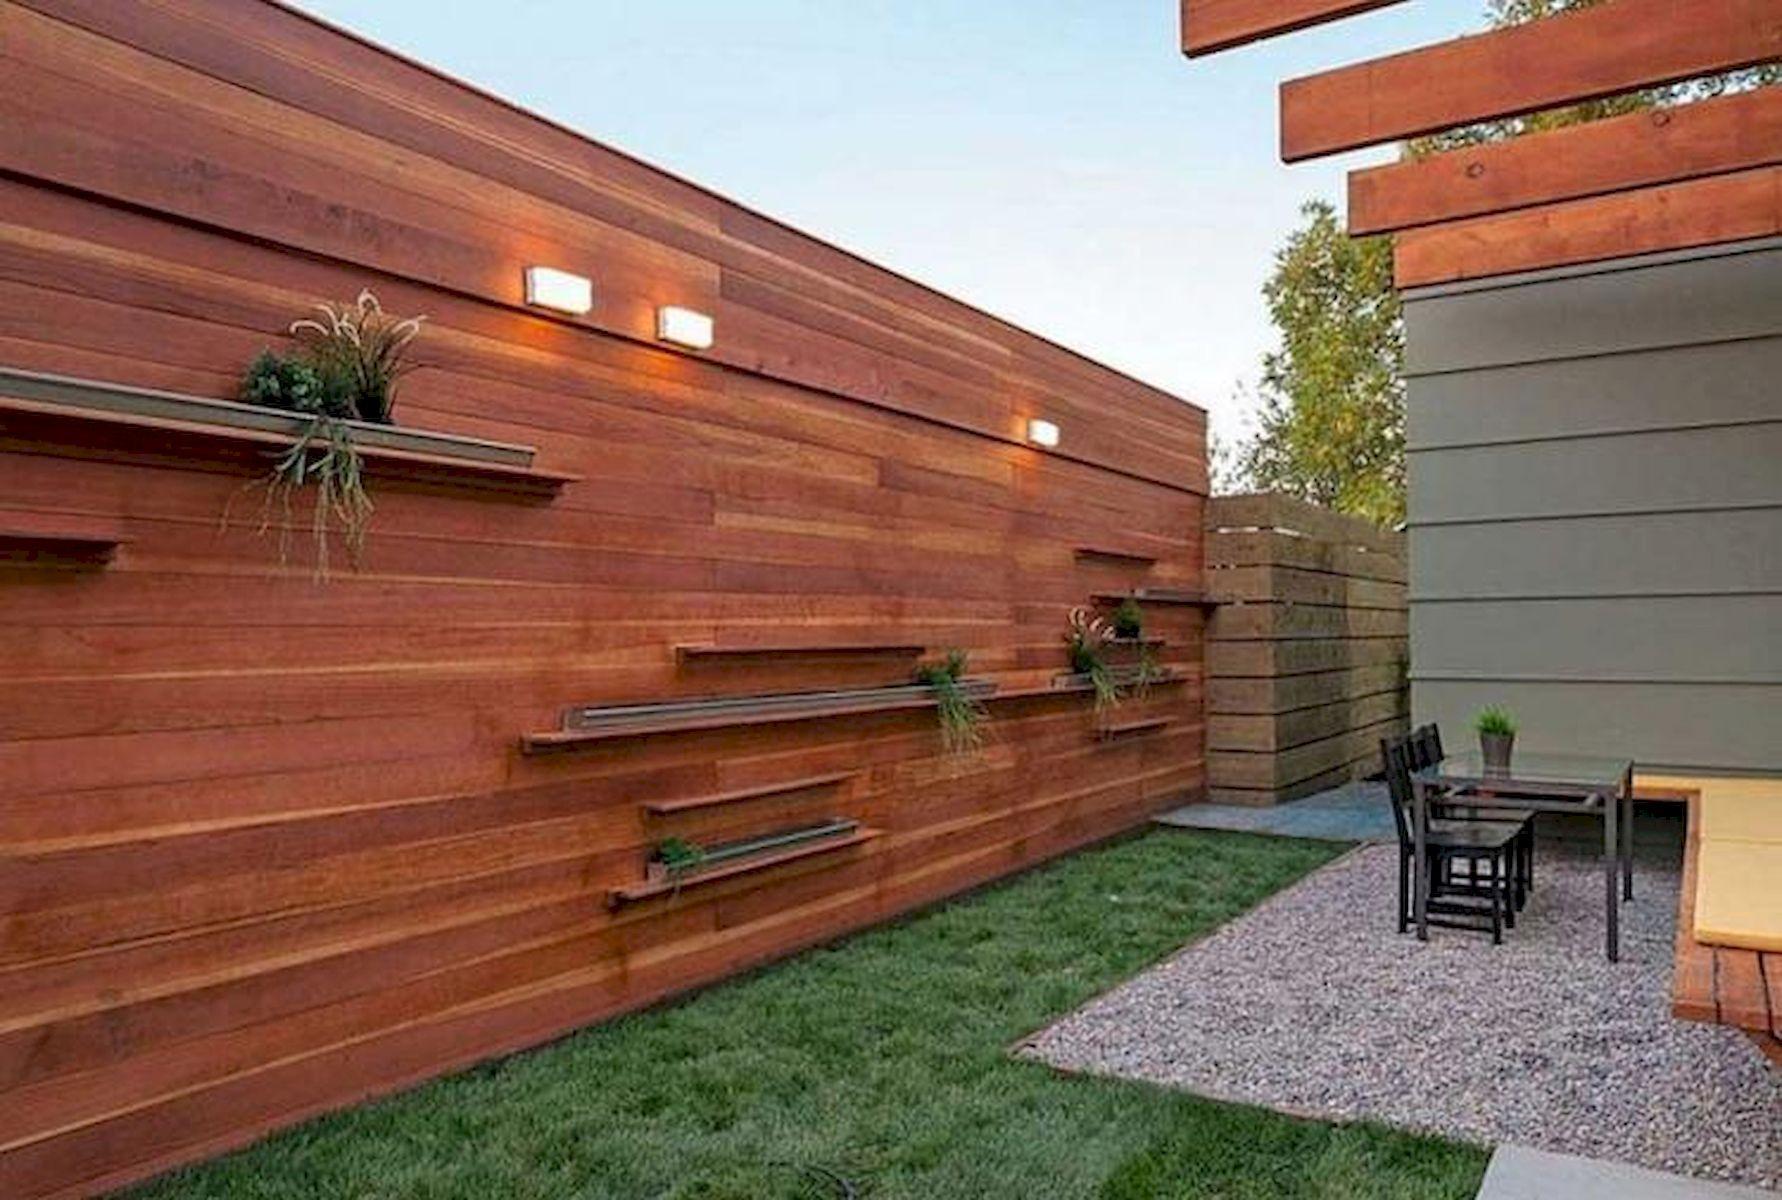 60 Awesome DIY Backyard Privacy Design And Decor Ideas (4)